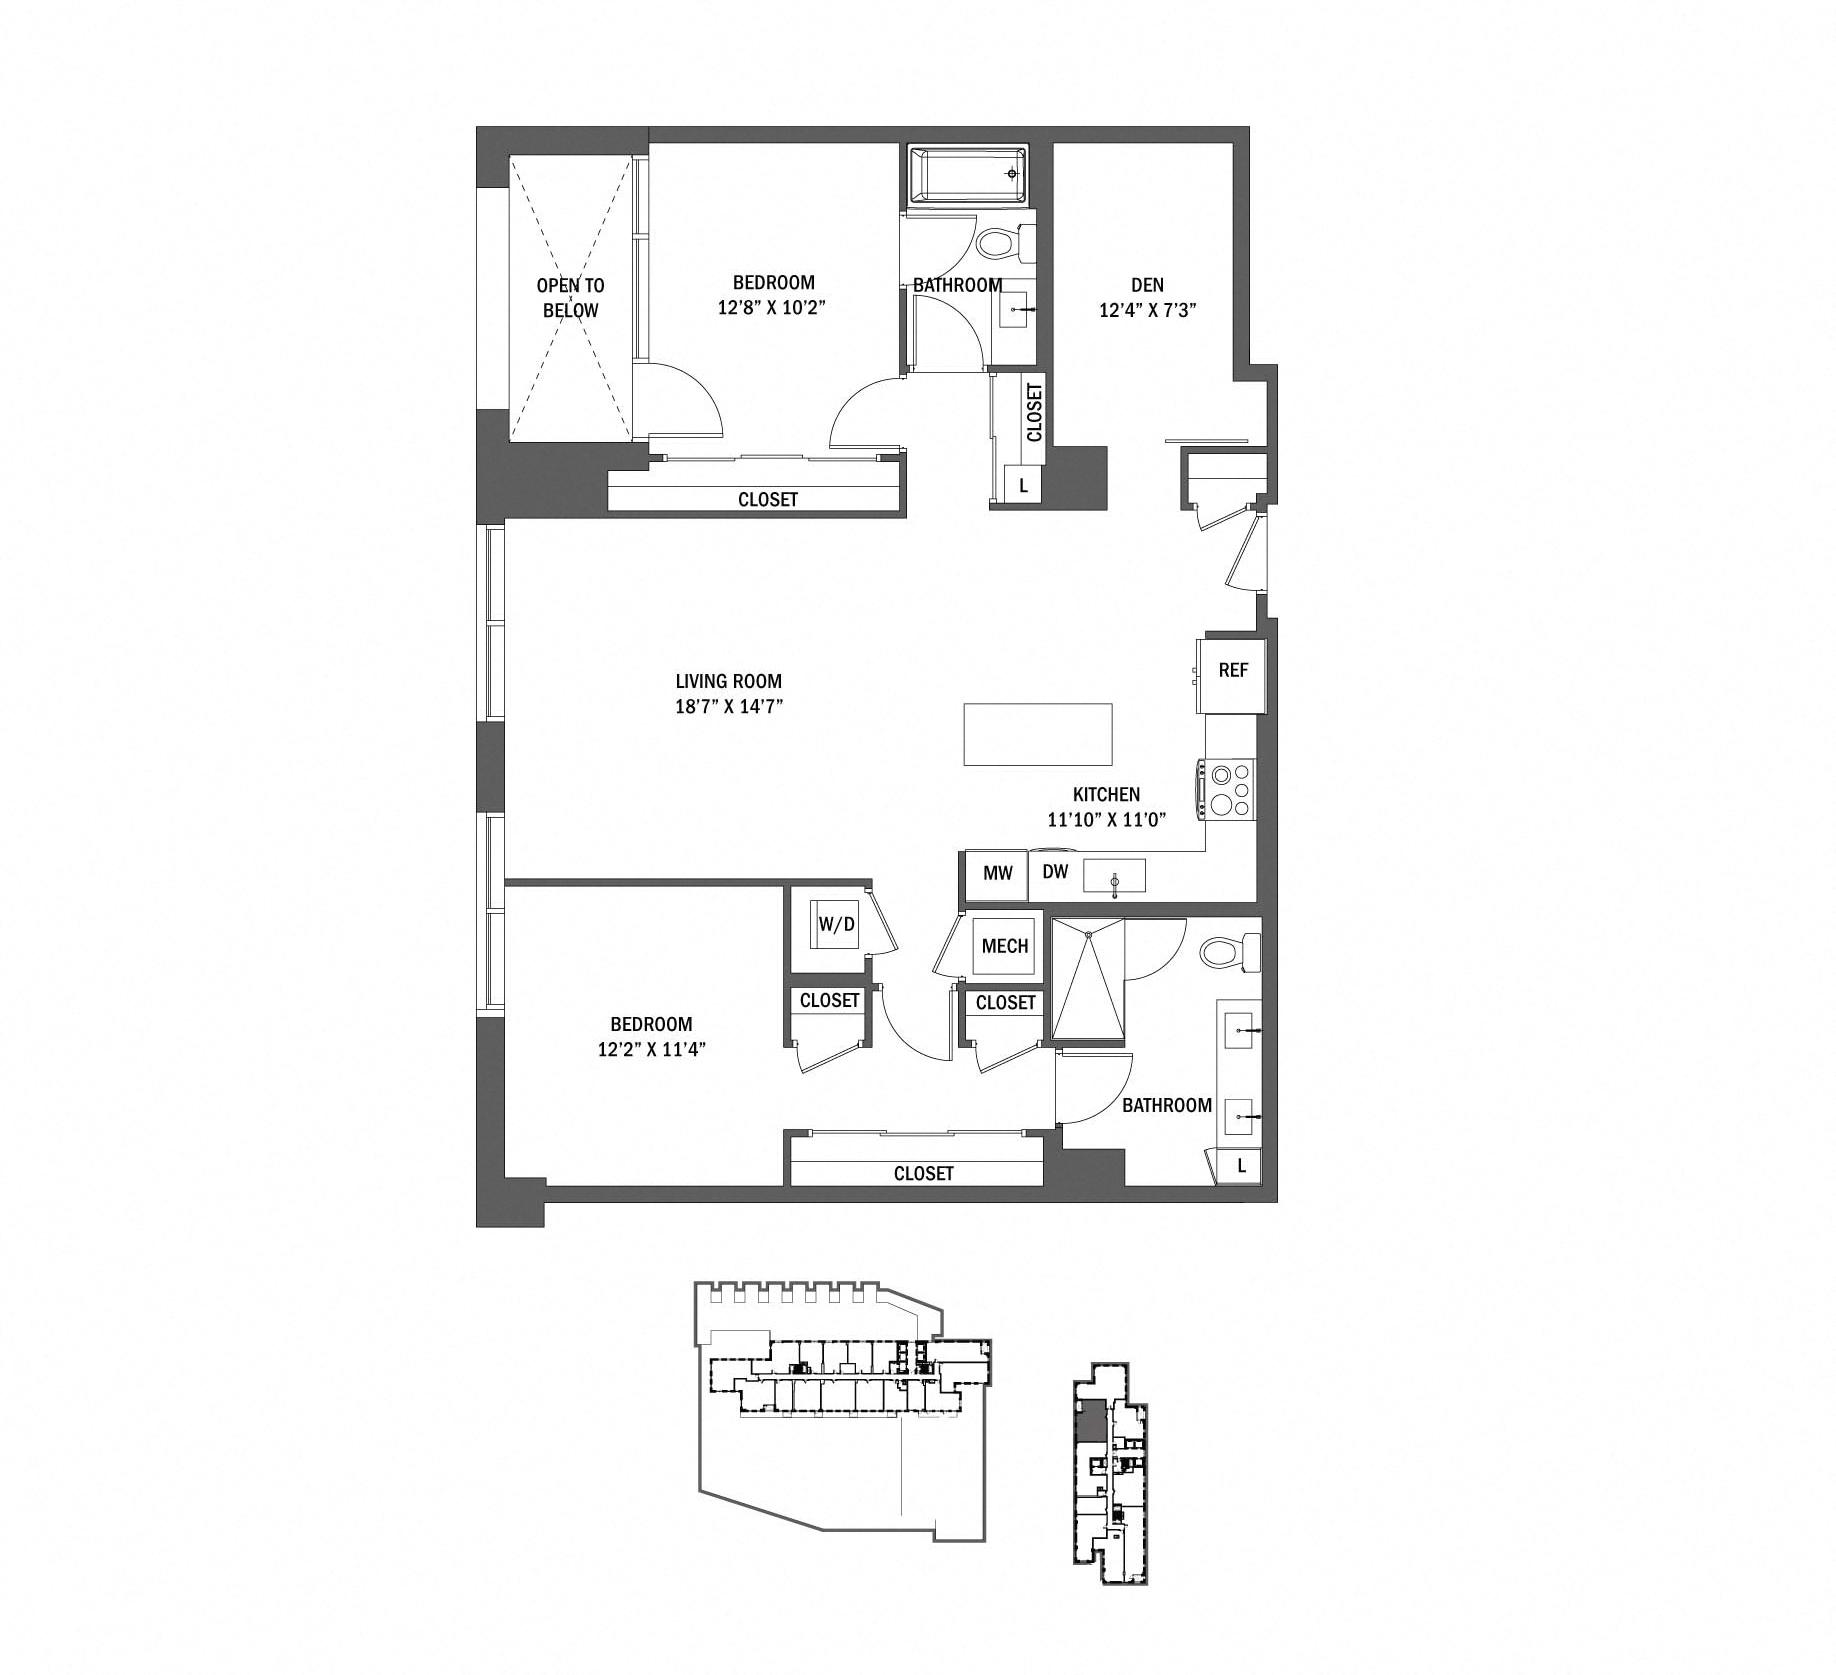 P0625338 e03 18pa 2 floorplan